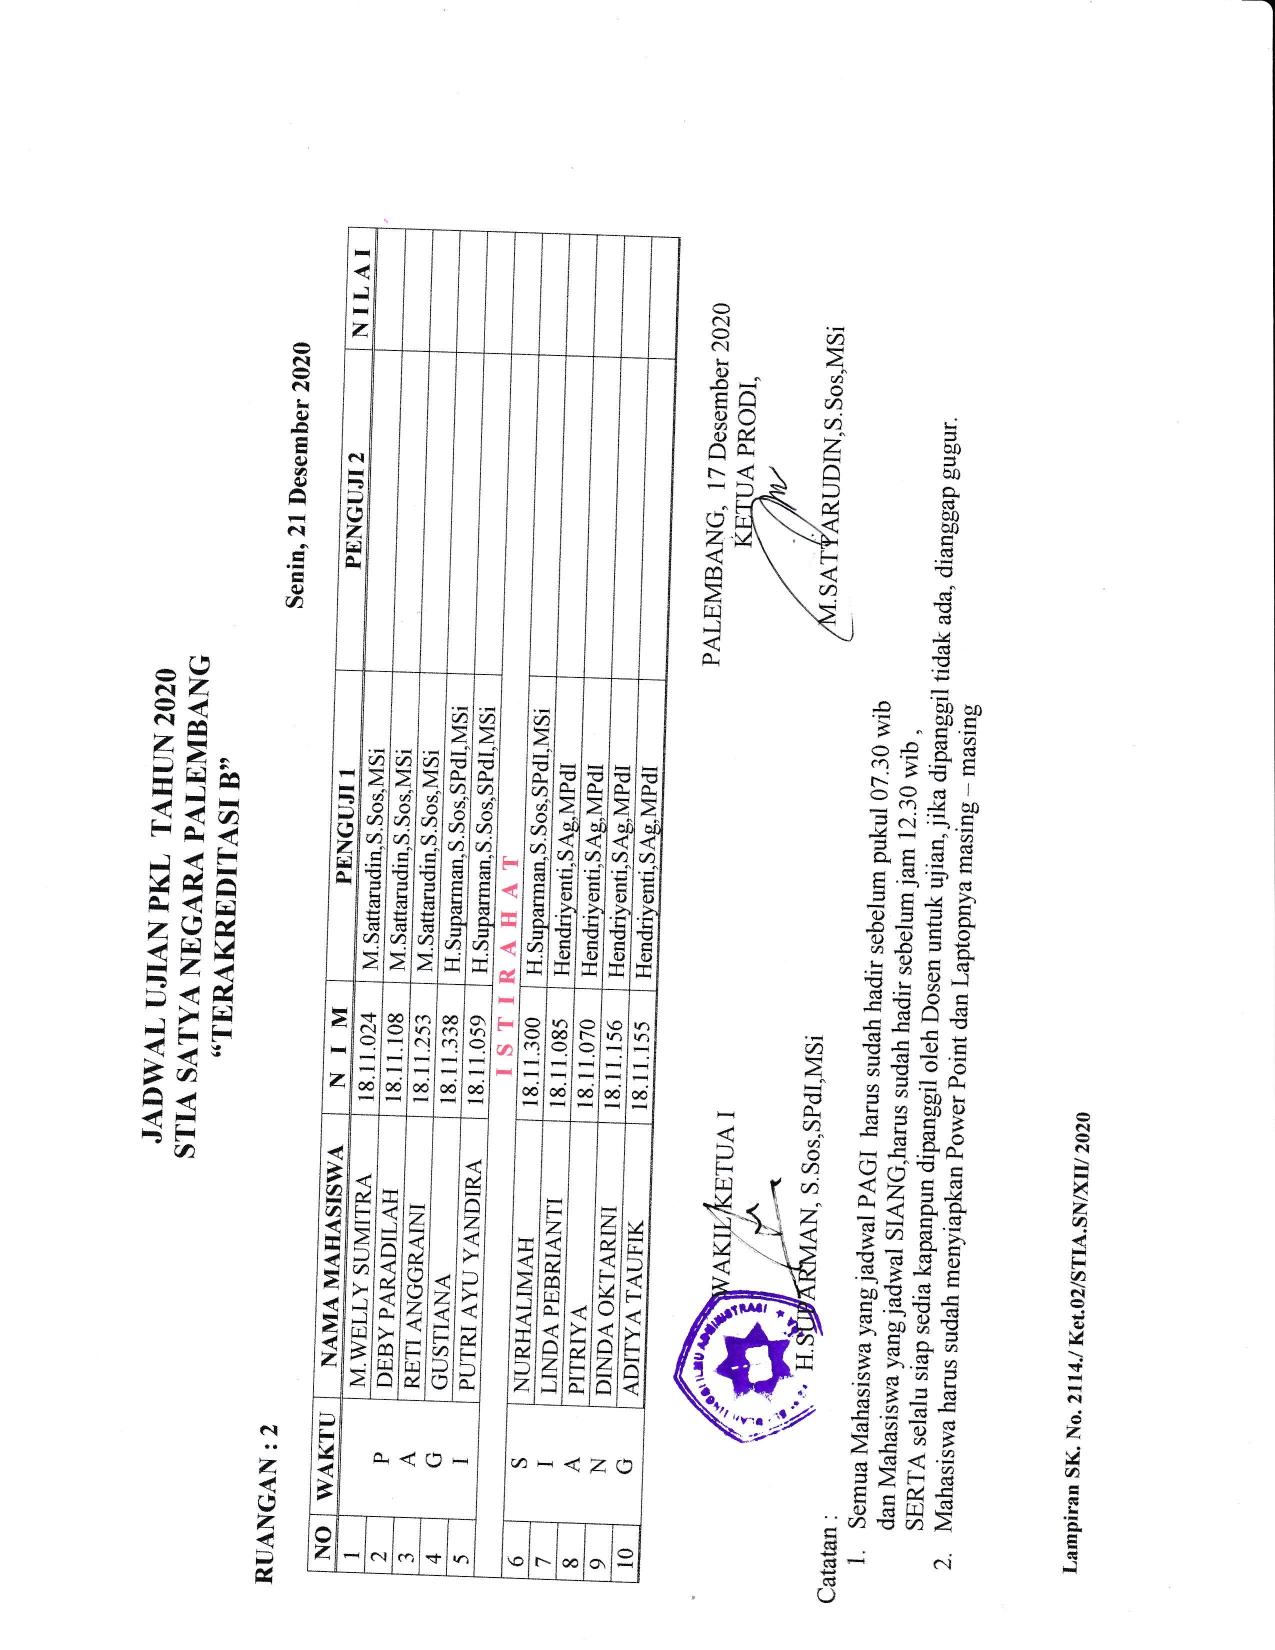 Ujian PKL tanggal 212